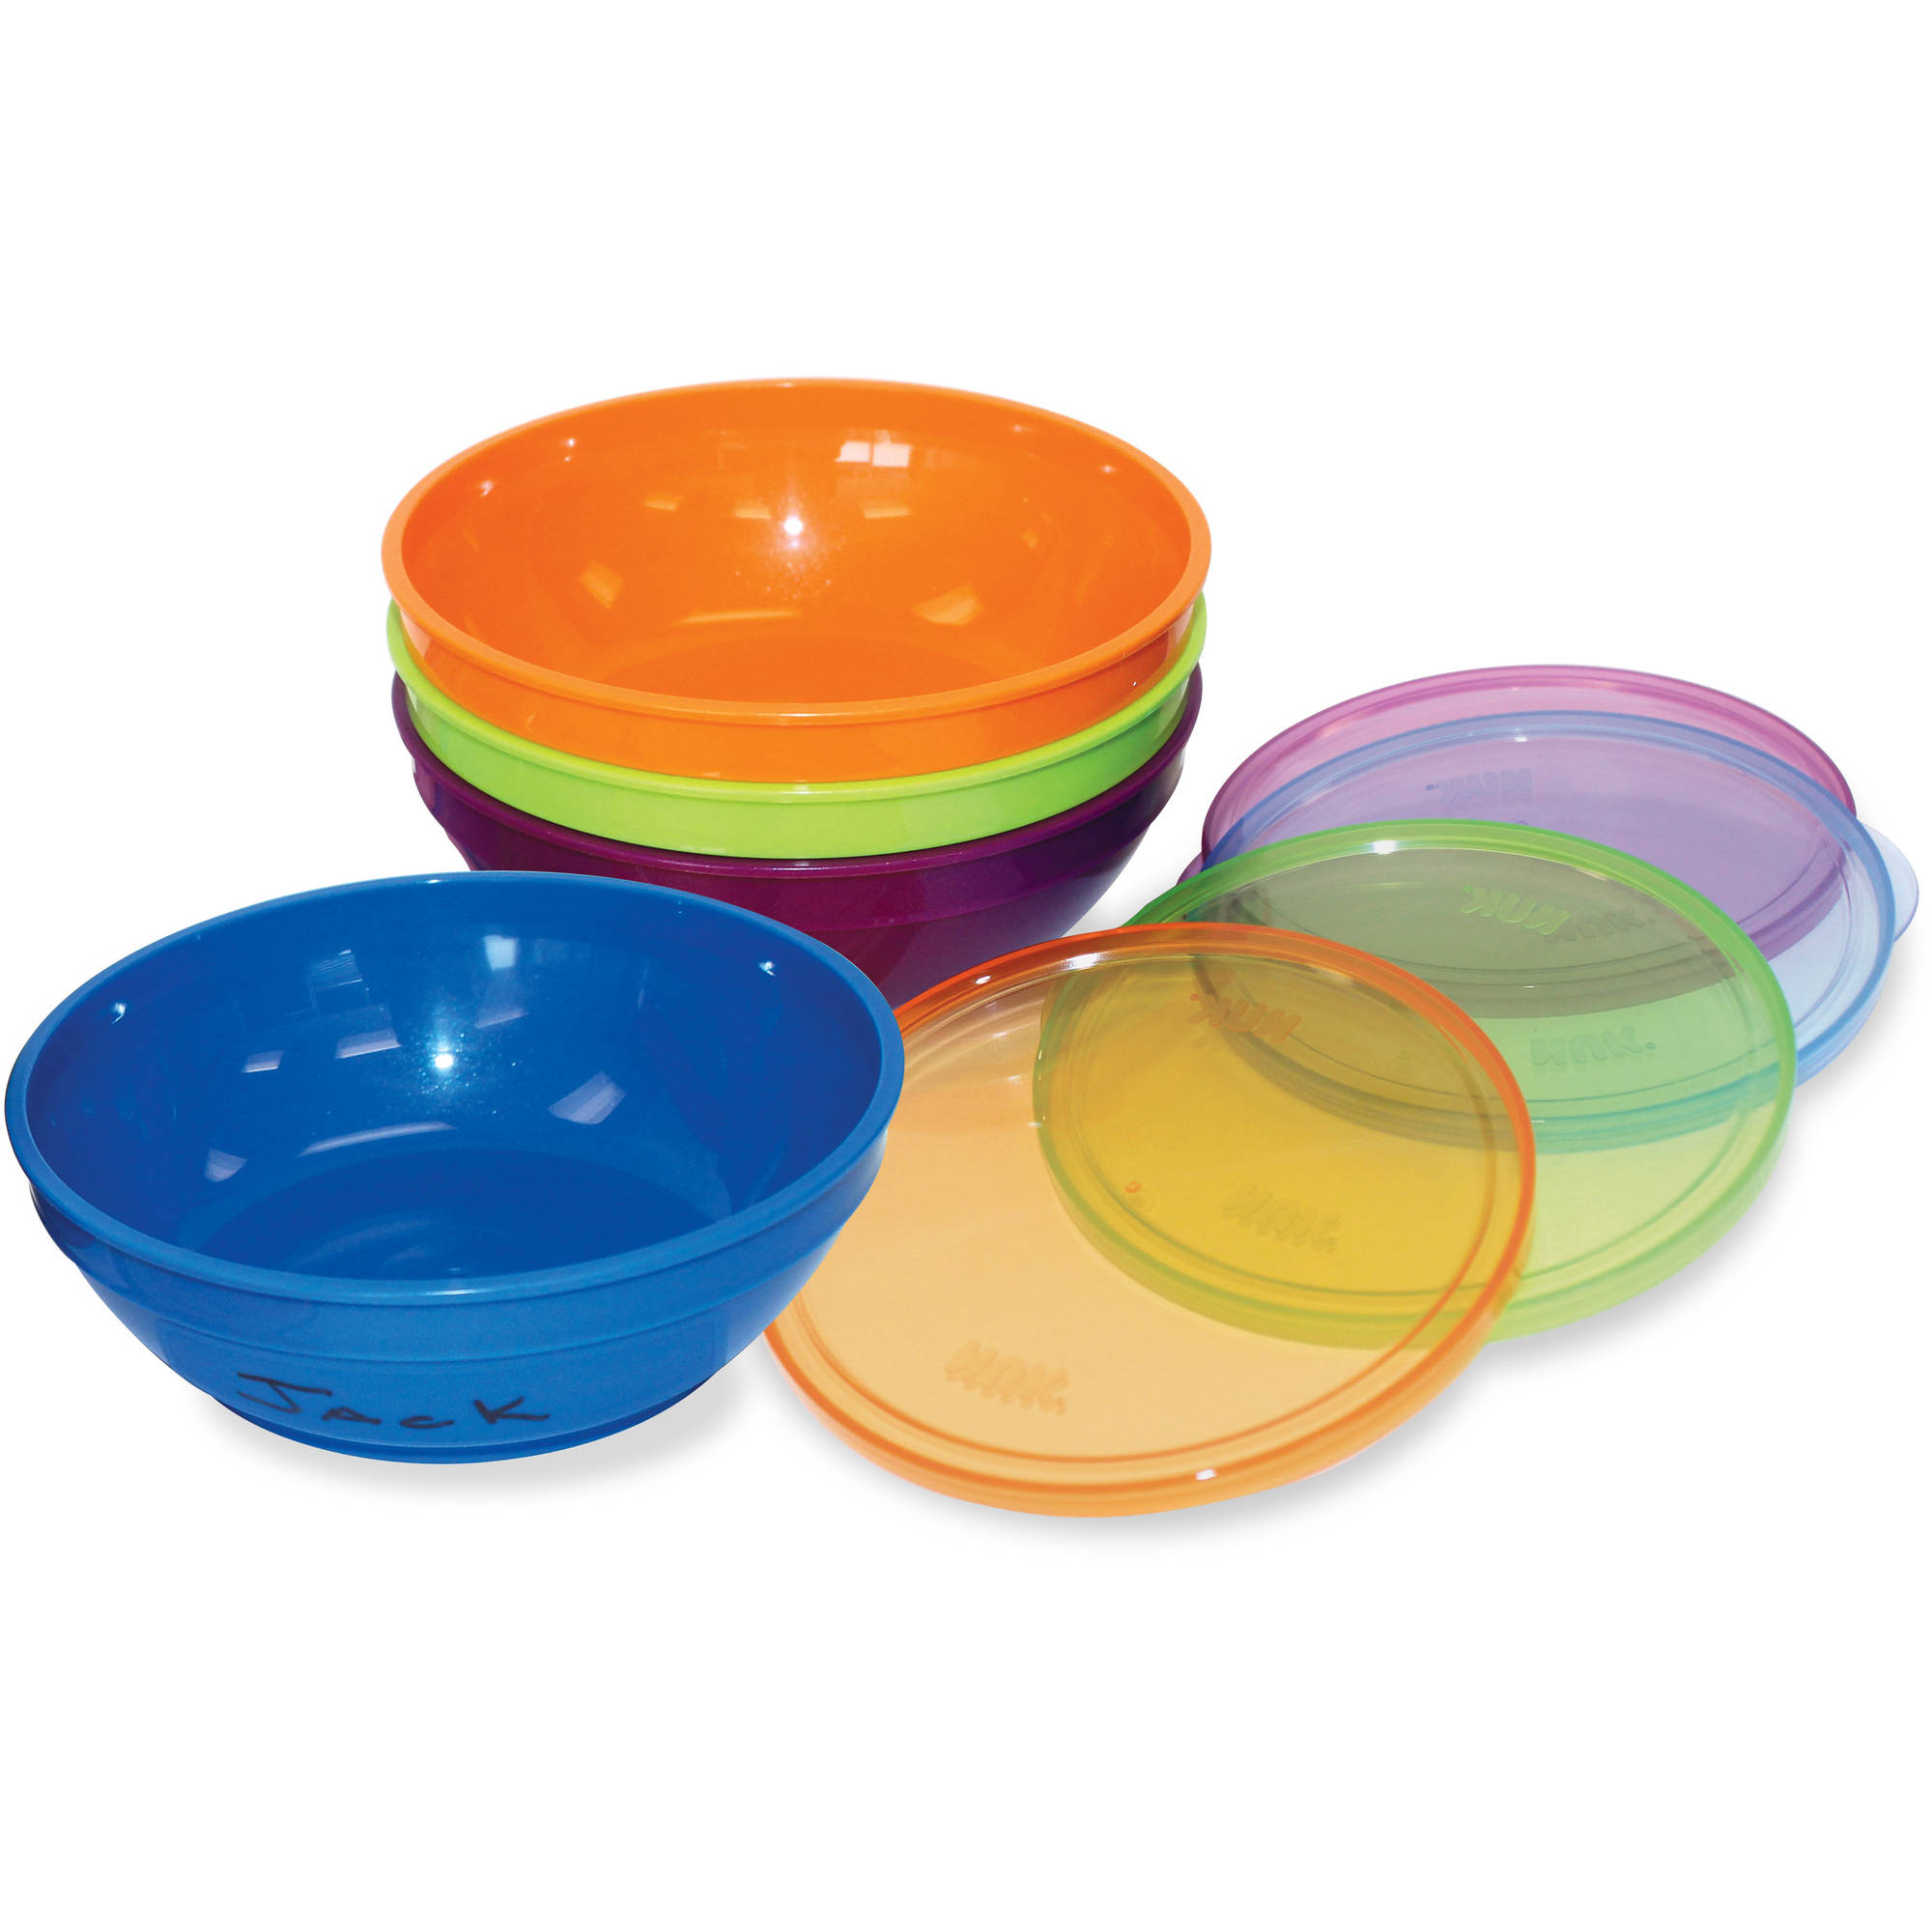 Gerber Graduates Bunch-A-Bowls Bowls And Lids, BPA-Free, 4ct